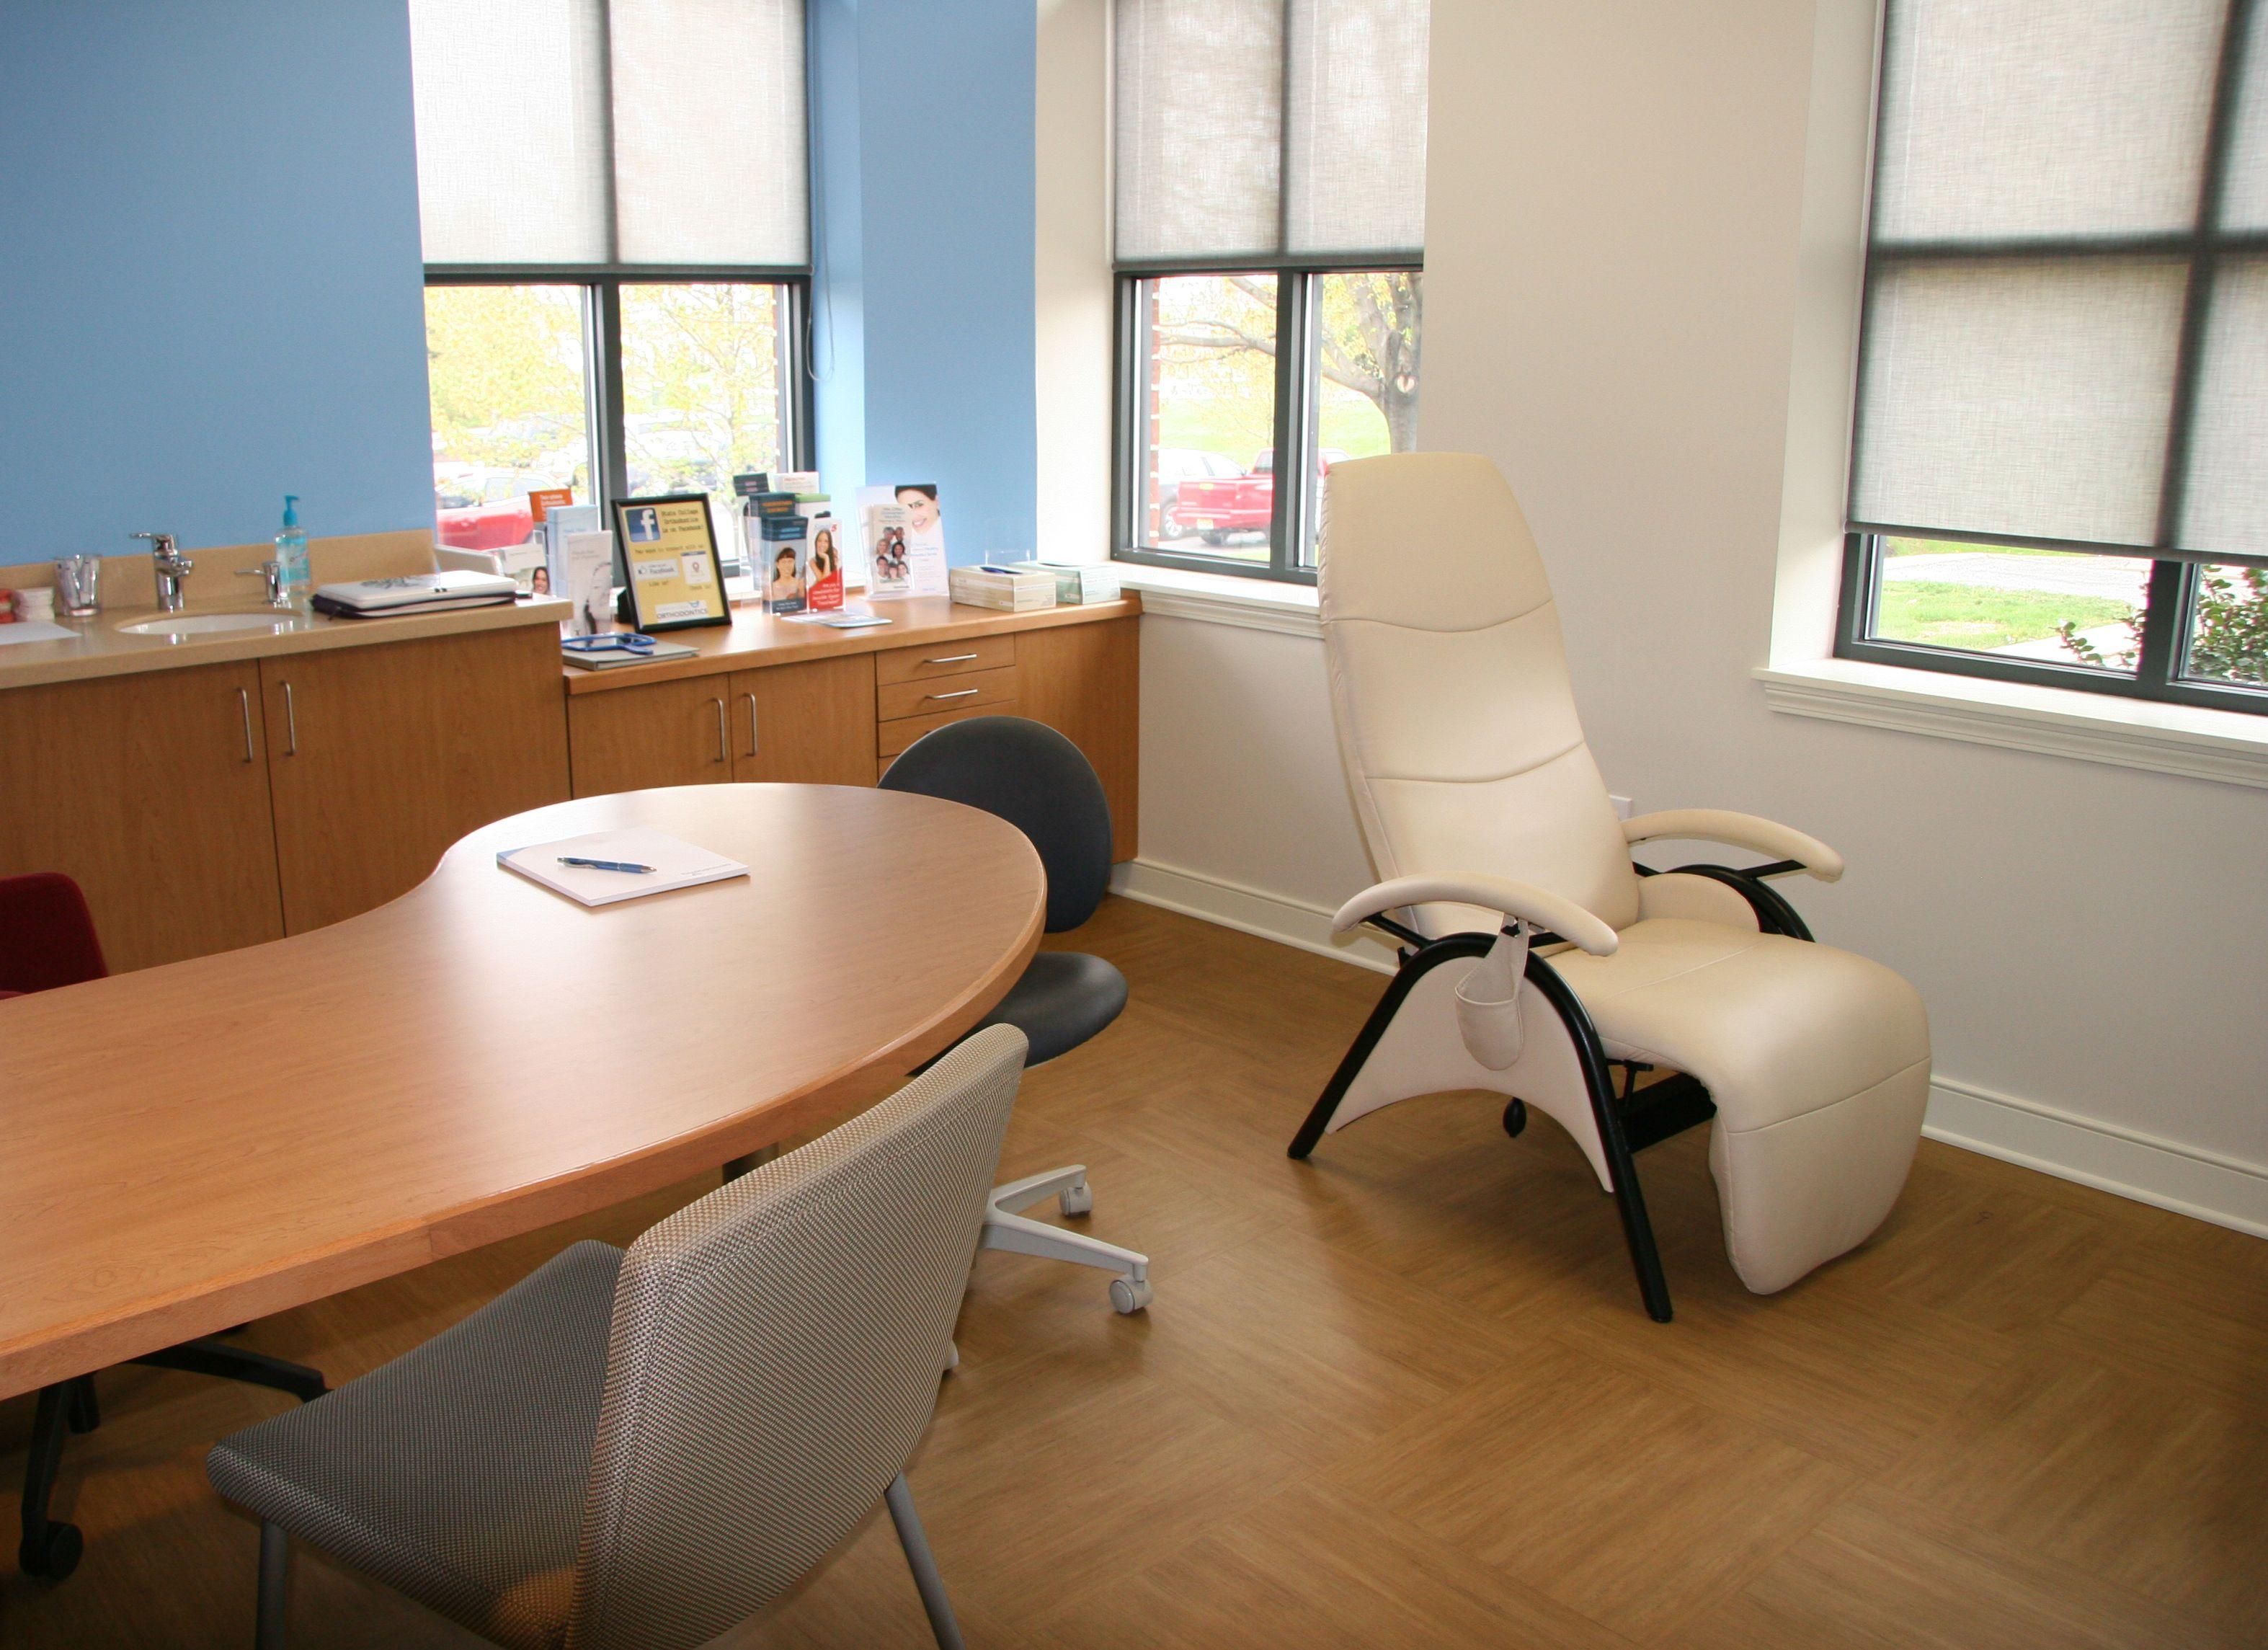 Zero gravity exam chair in orthodontic consultation room